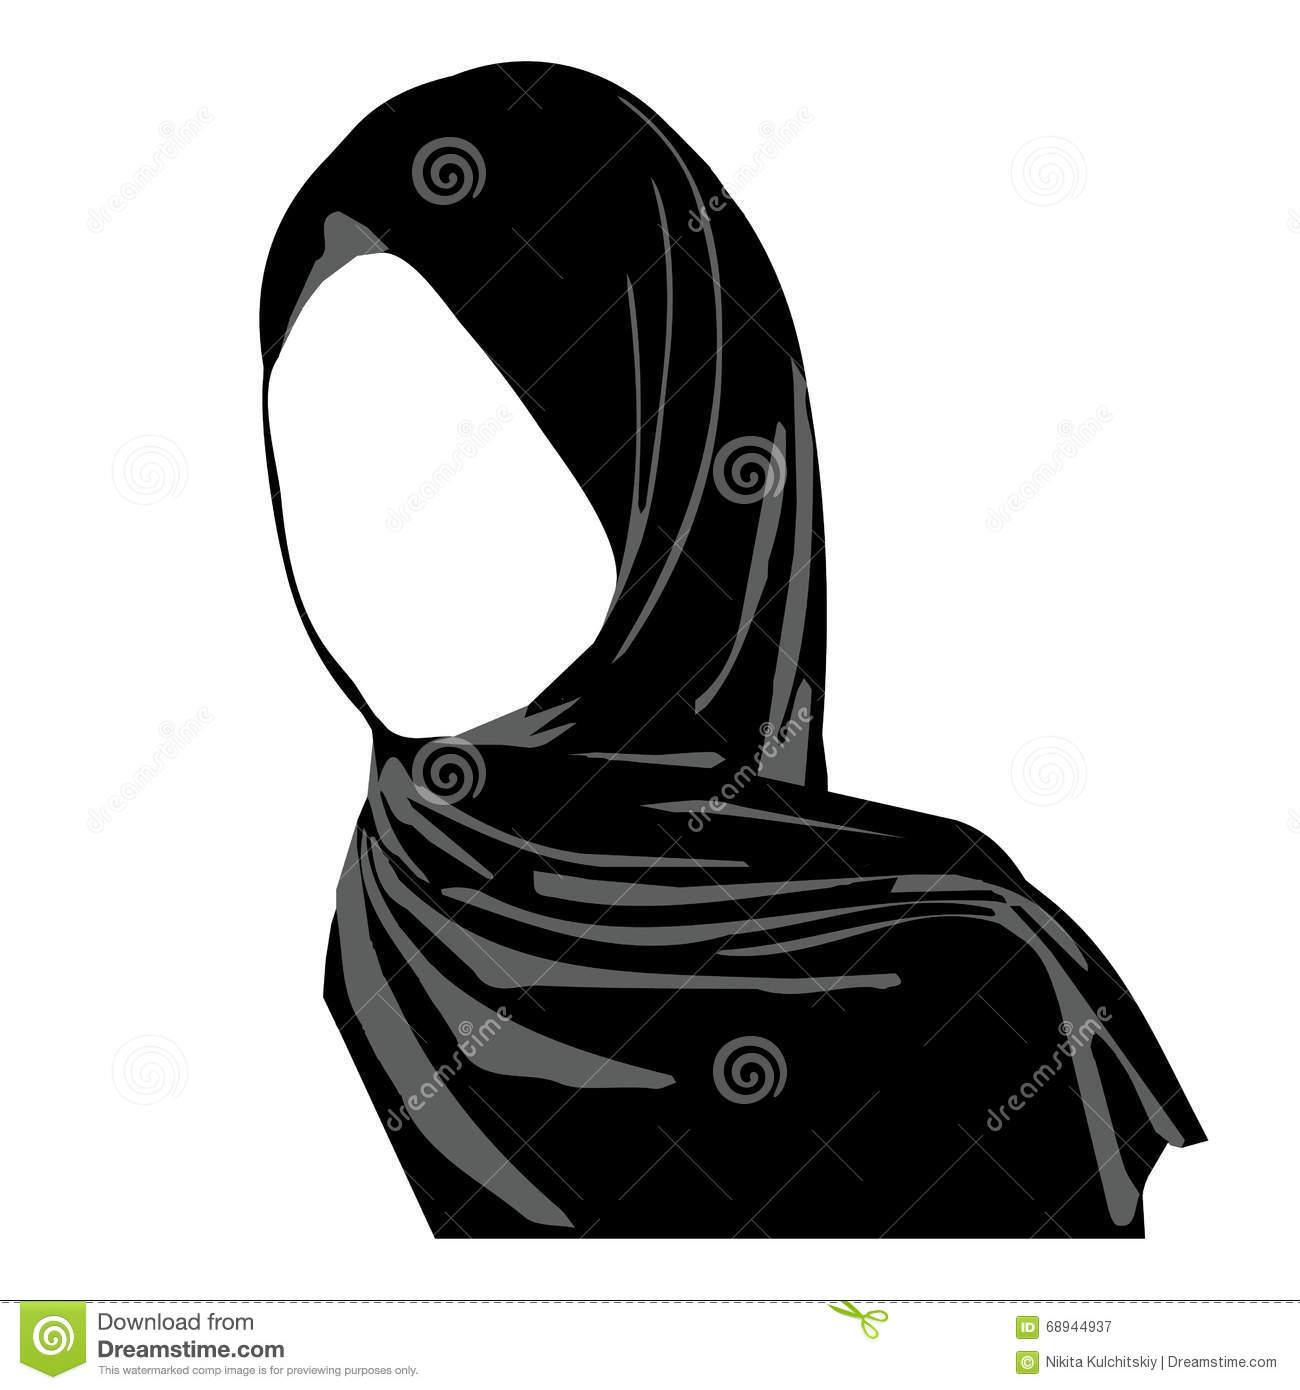 Hijab clipart image jpg freeuse stock Hijab clipart 5 » Clipart Station jpg freeuse stock